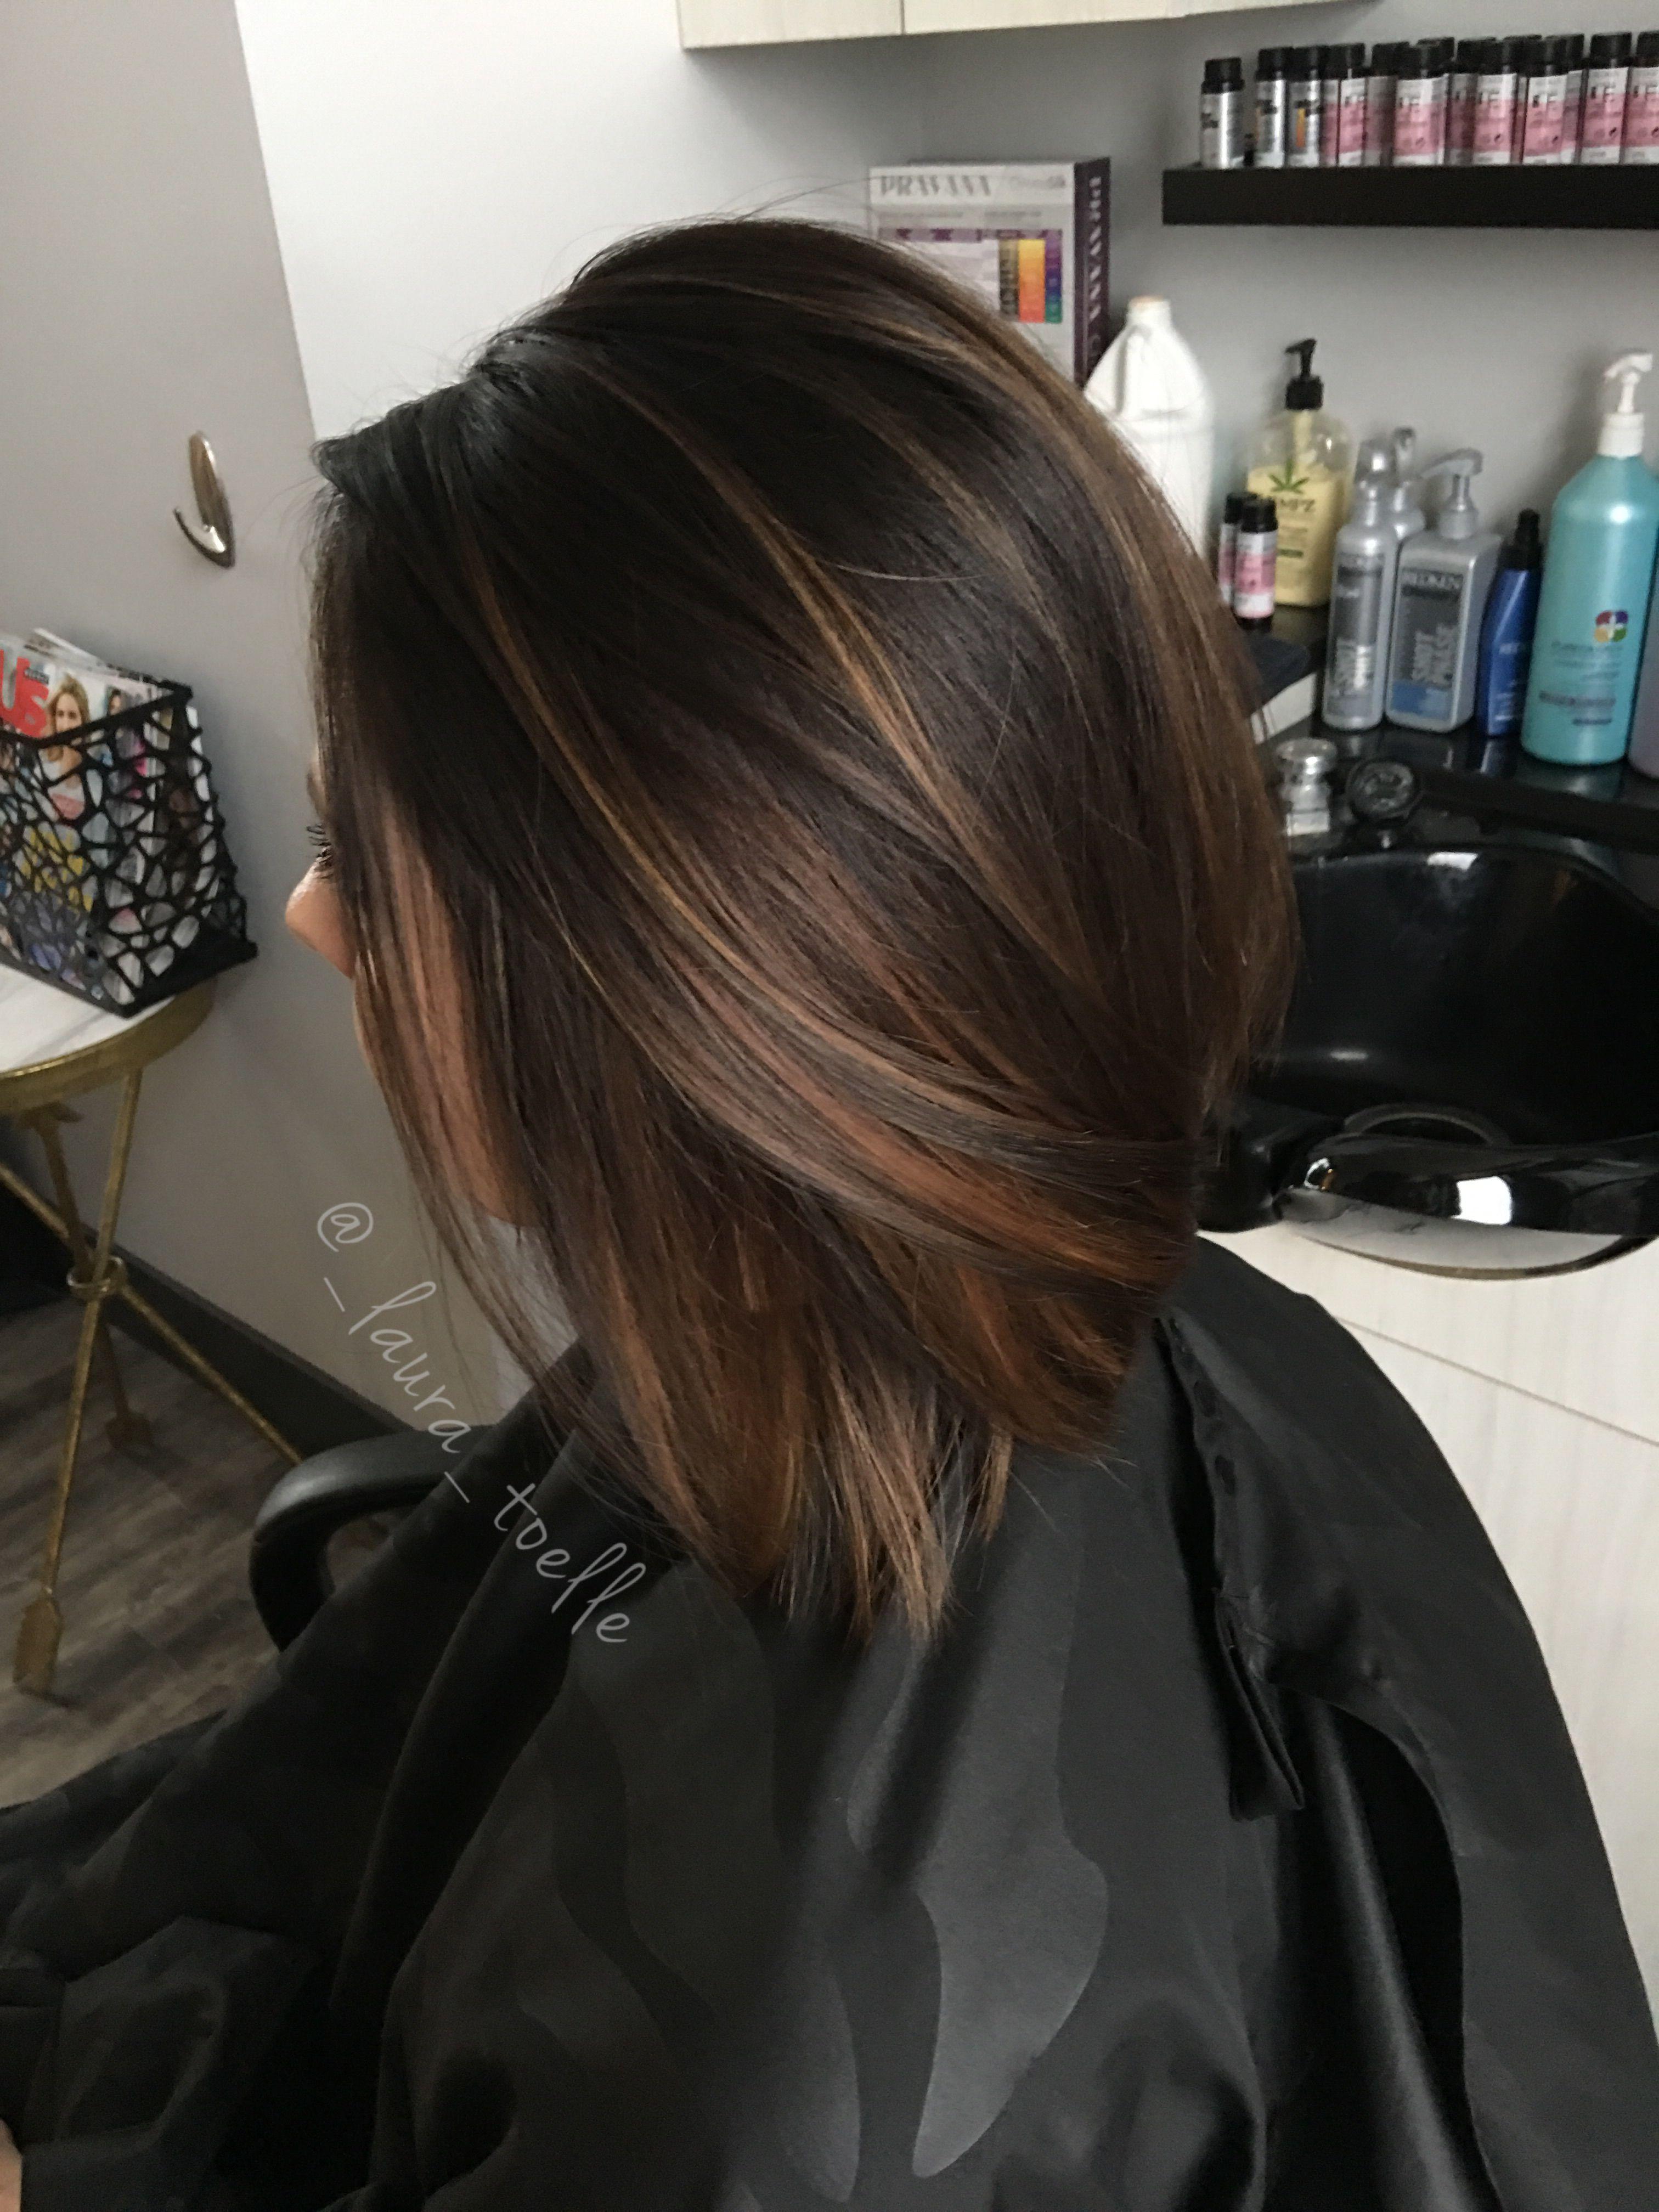 Caramel highlights dark brown hair lkhairstudios hair care caramel highlights dark brown hair lkhairstudios pmusecretfo Image collections